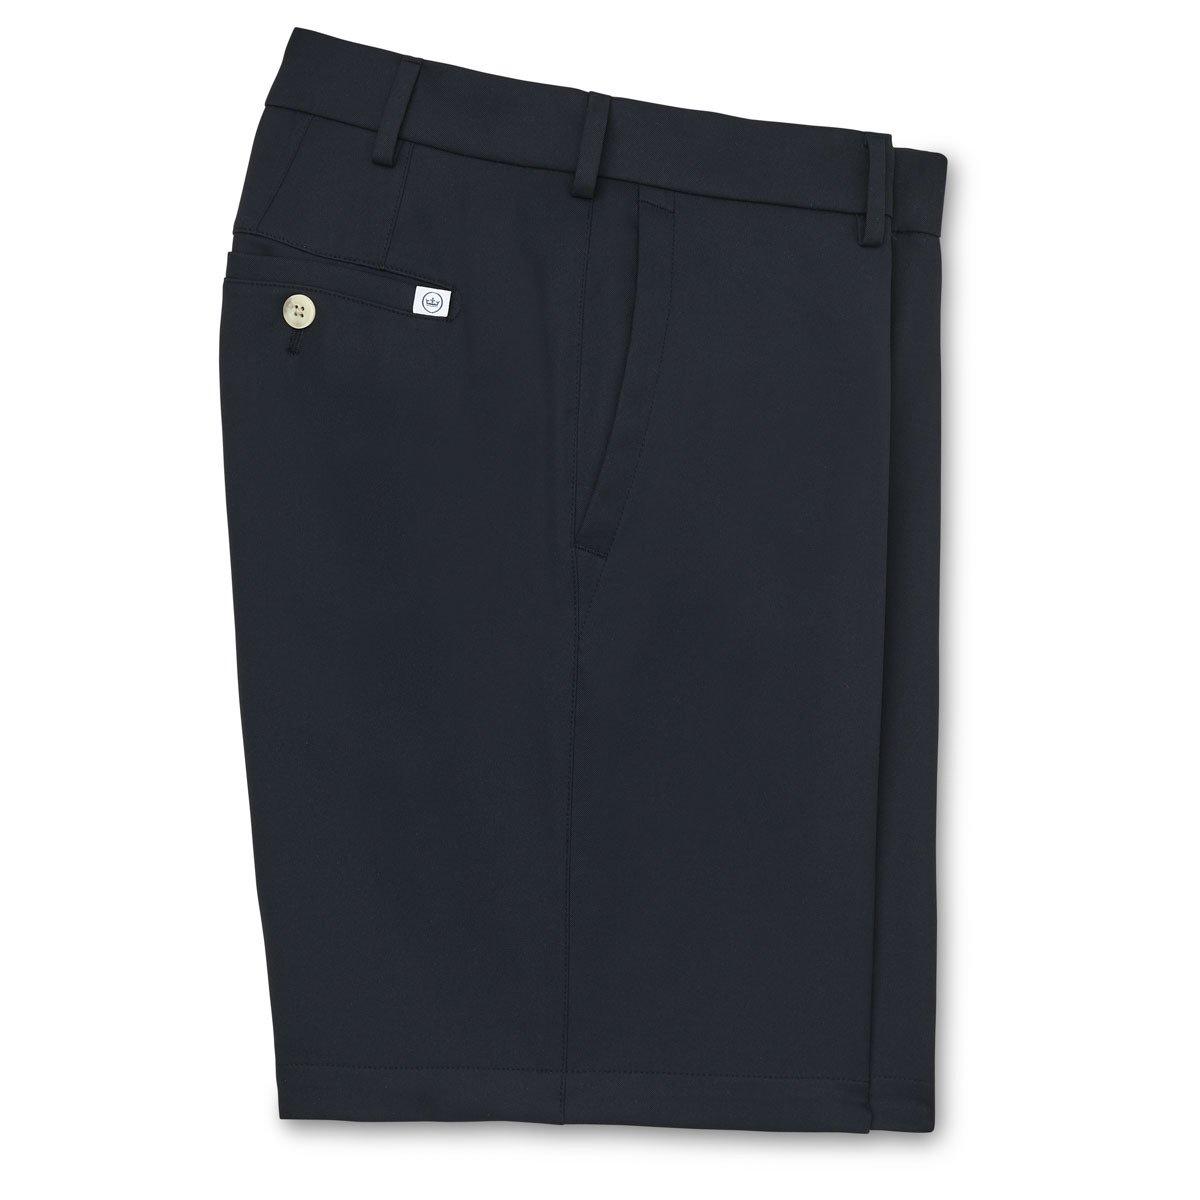 Men's Peter Millar Salem High Drape Performance Golf Short - Black - US SIZE 34